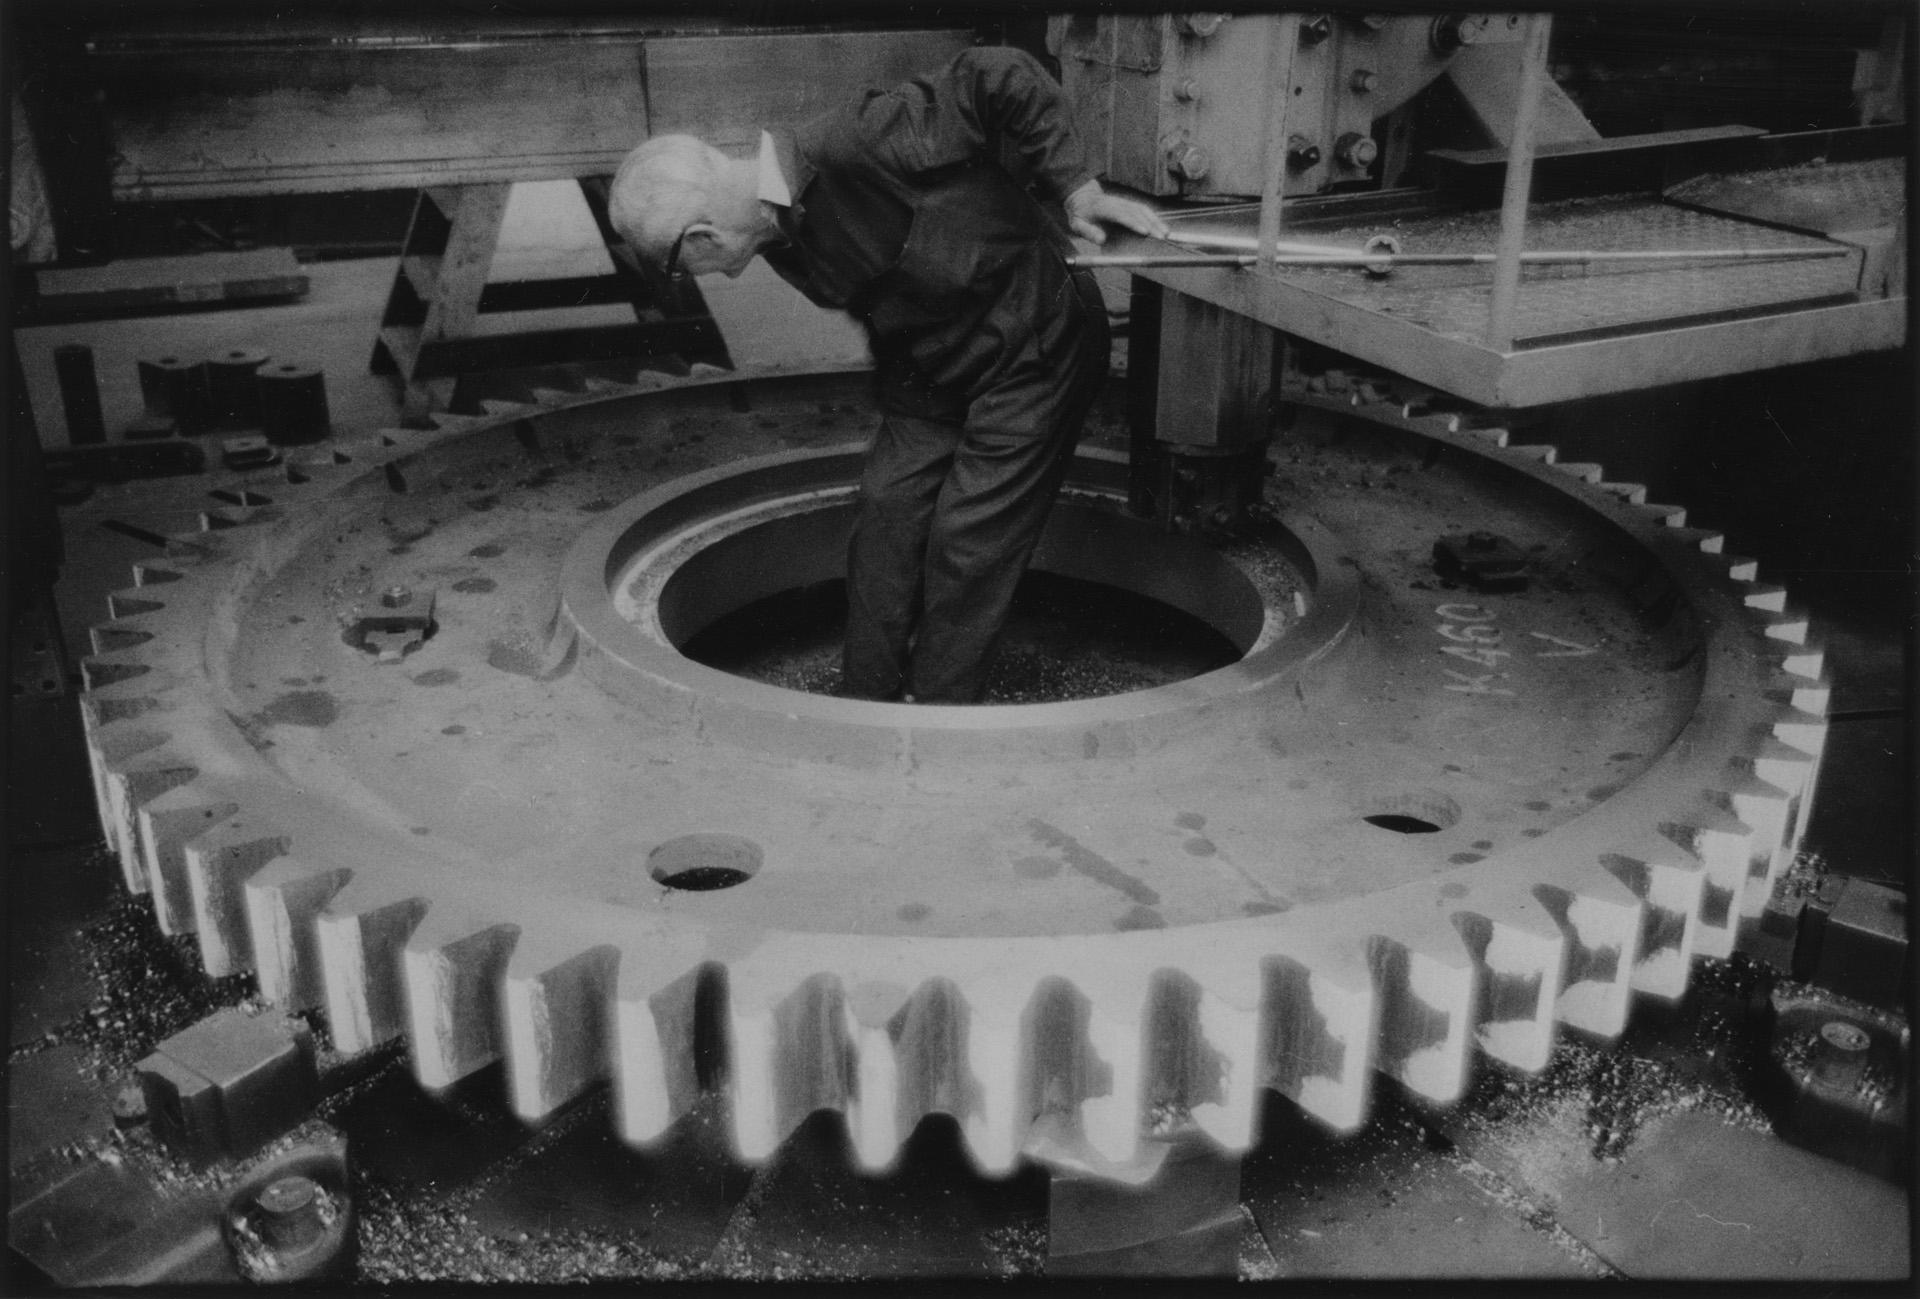 John Hendry, Turner, Boring & Facing Turning Wheel for Ships Main Engine; John G. Kincaid Engineer